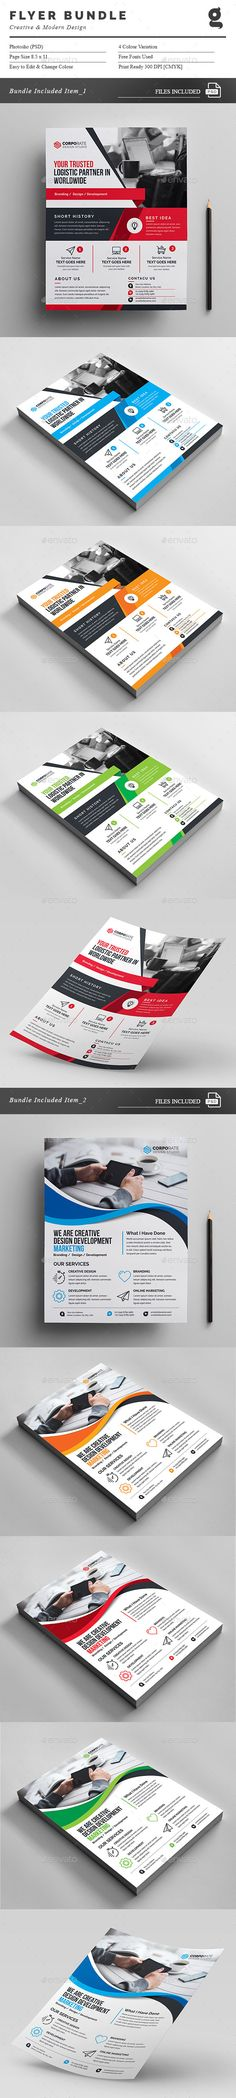 177 best Brochures images on Pinterest Brochures, Brochure - sell sheet template